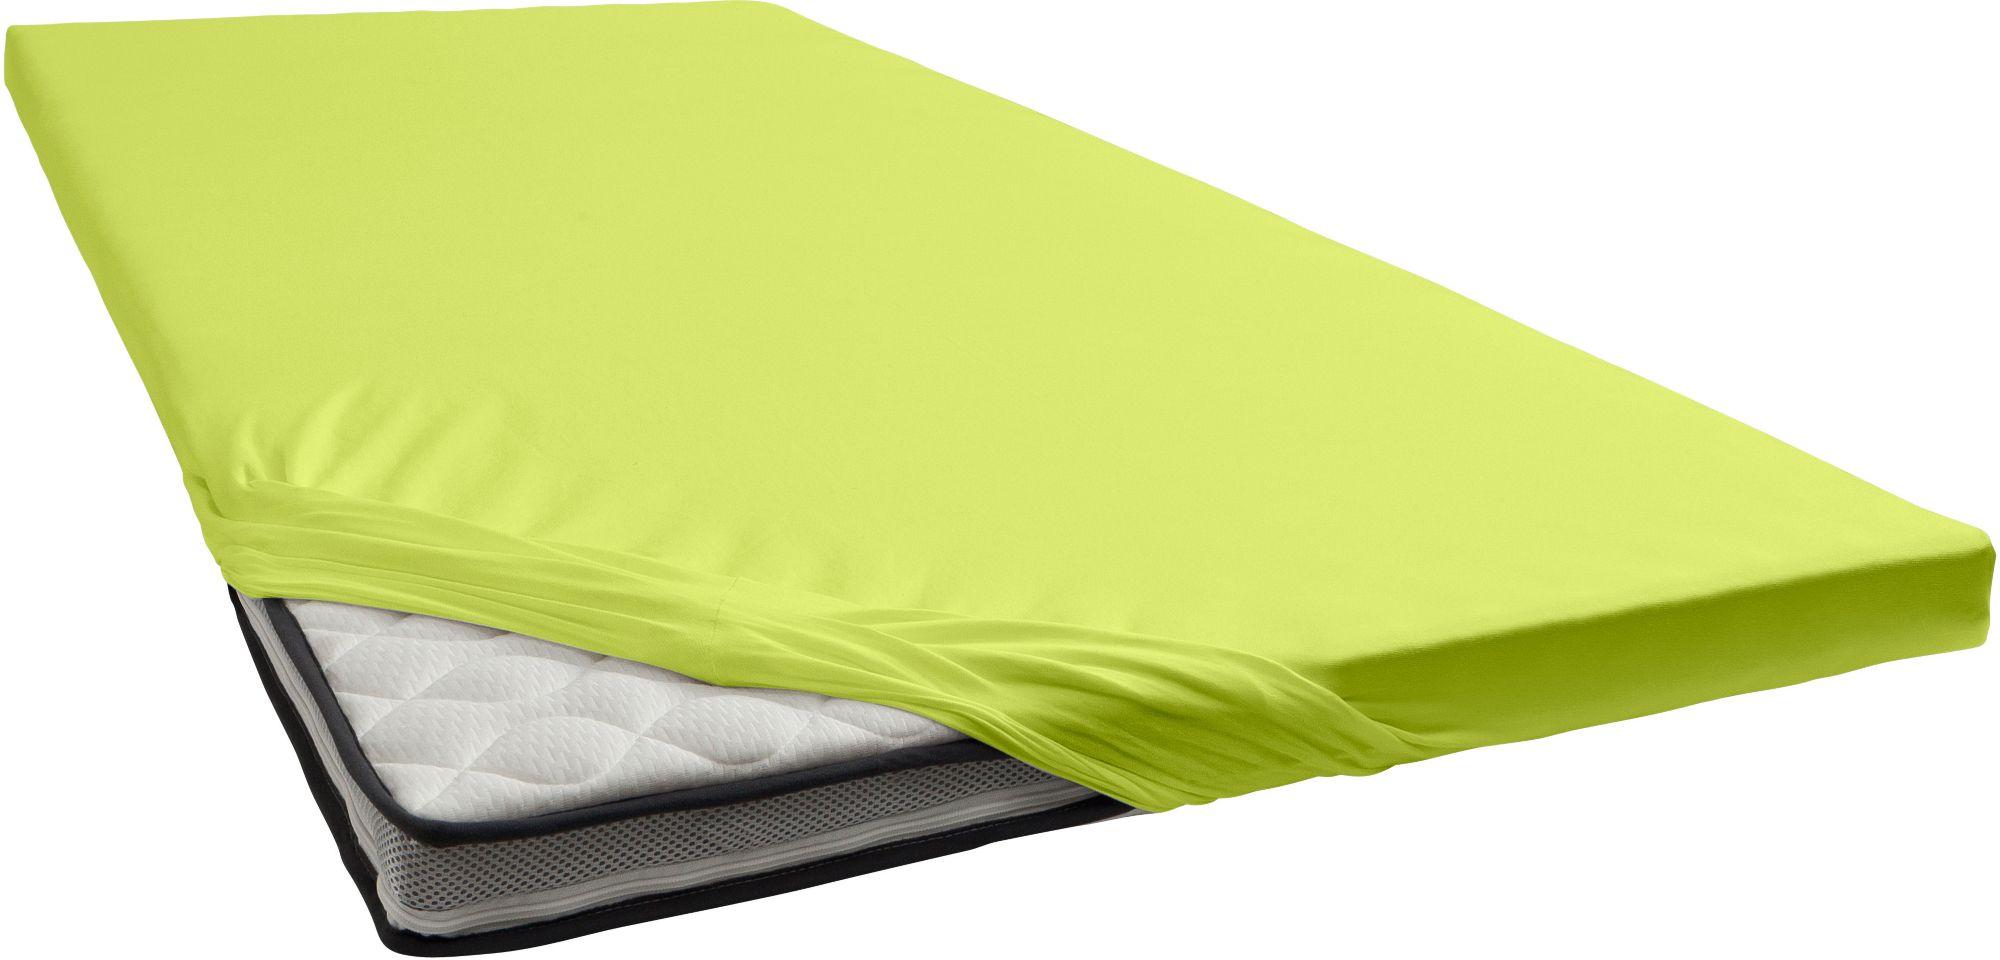 spannbettlaken damai renforc f r topper schwab versand spannbettlaken f r topper. Black Bedroom Furniture Sets. Home Design Ideas